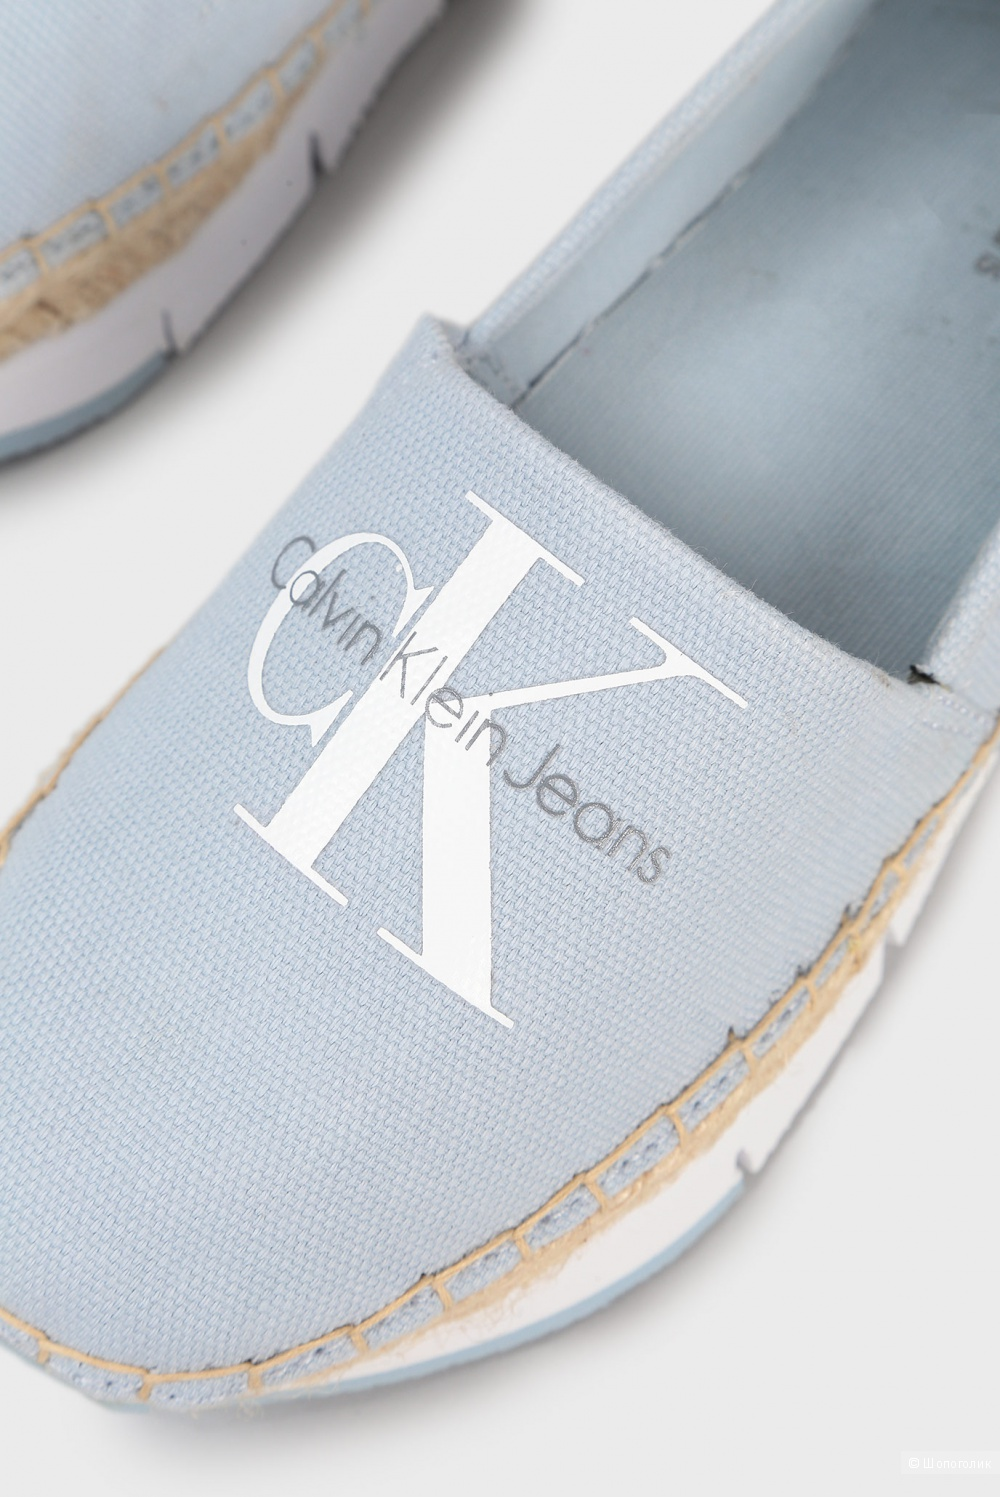 Эспадрильи - слипоны Calvin Klein 36-37 размер